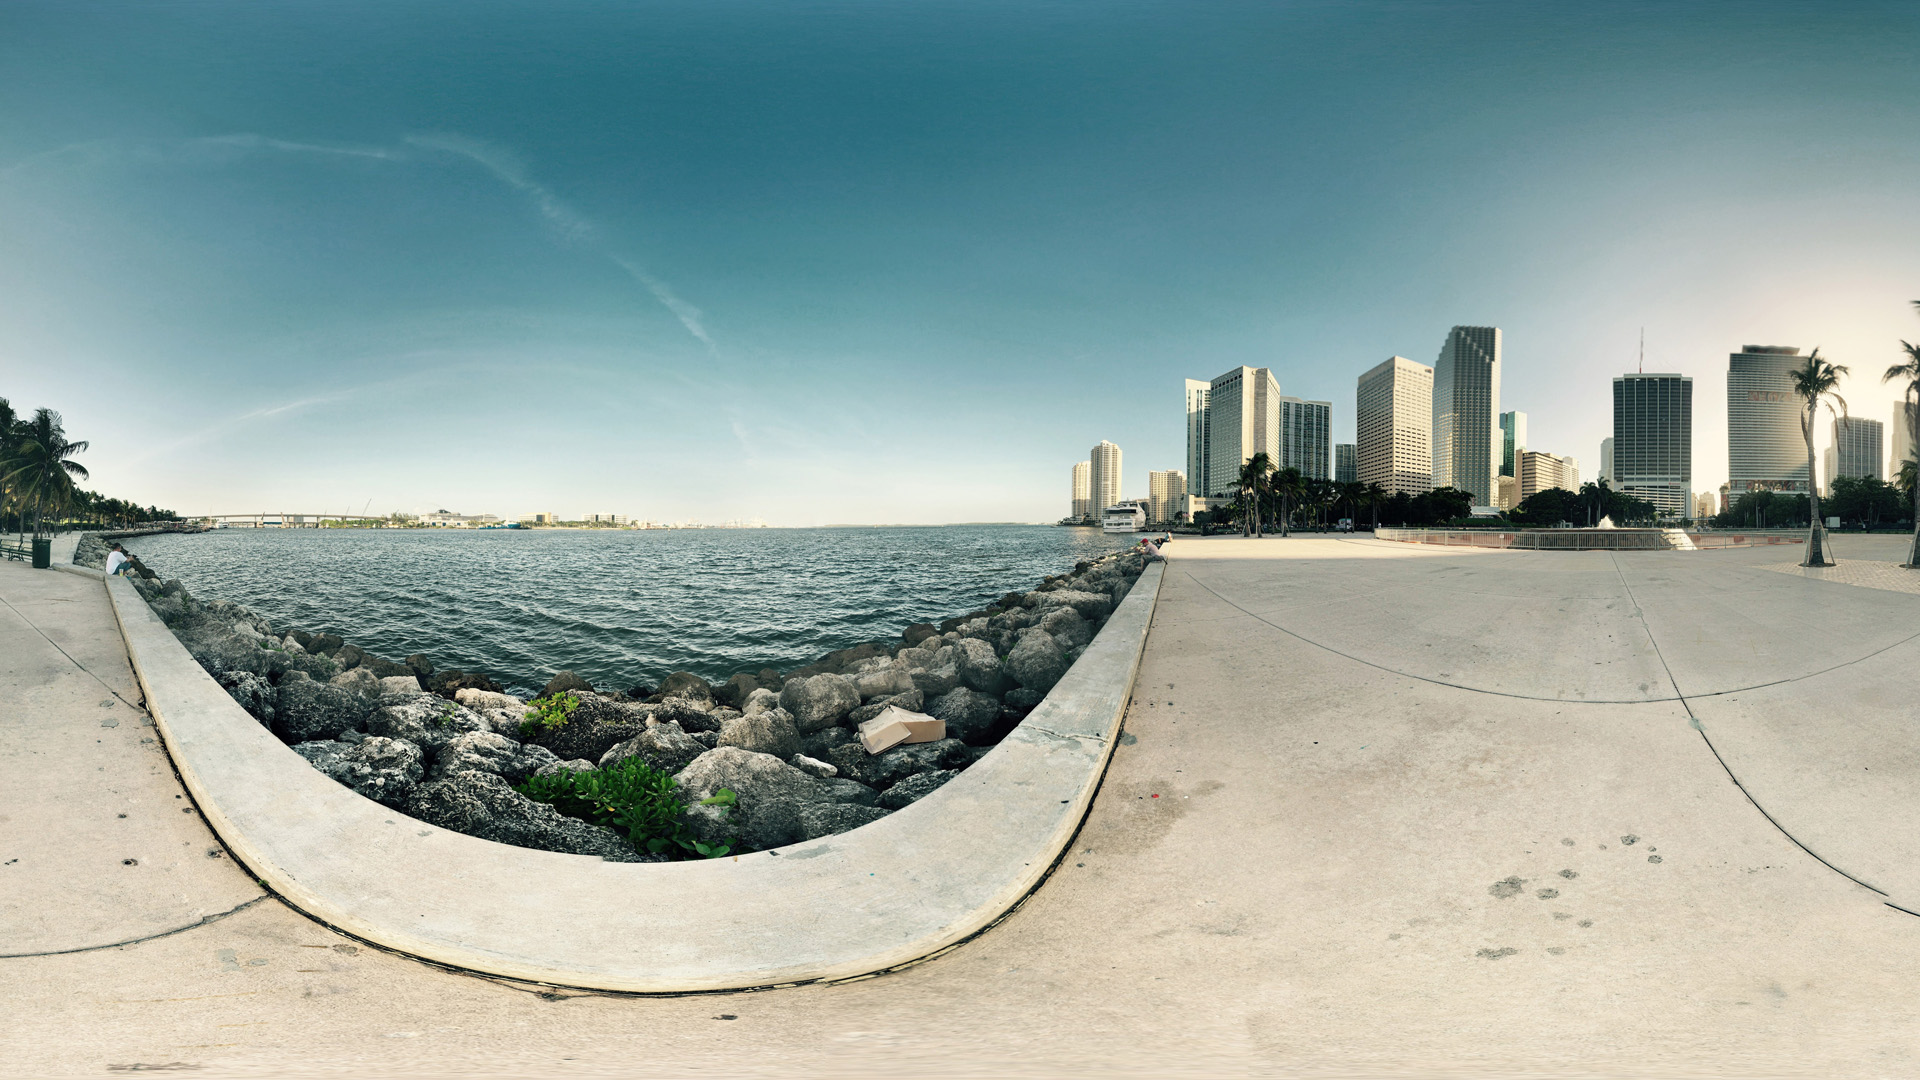 VR-Imagen-360-realidad-virtual-fotografia-360-experiencia-libre-grupoaudiovisual.com